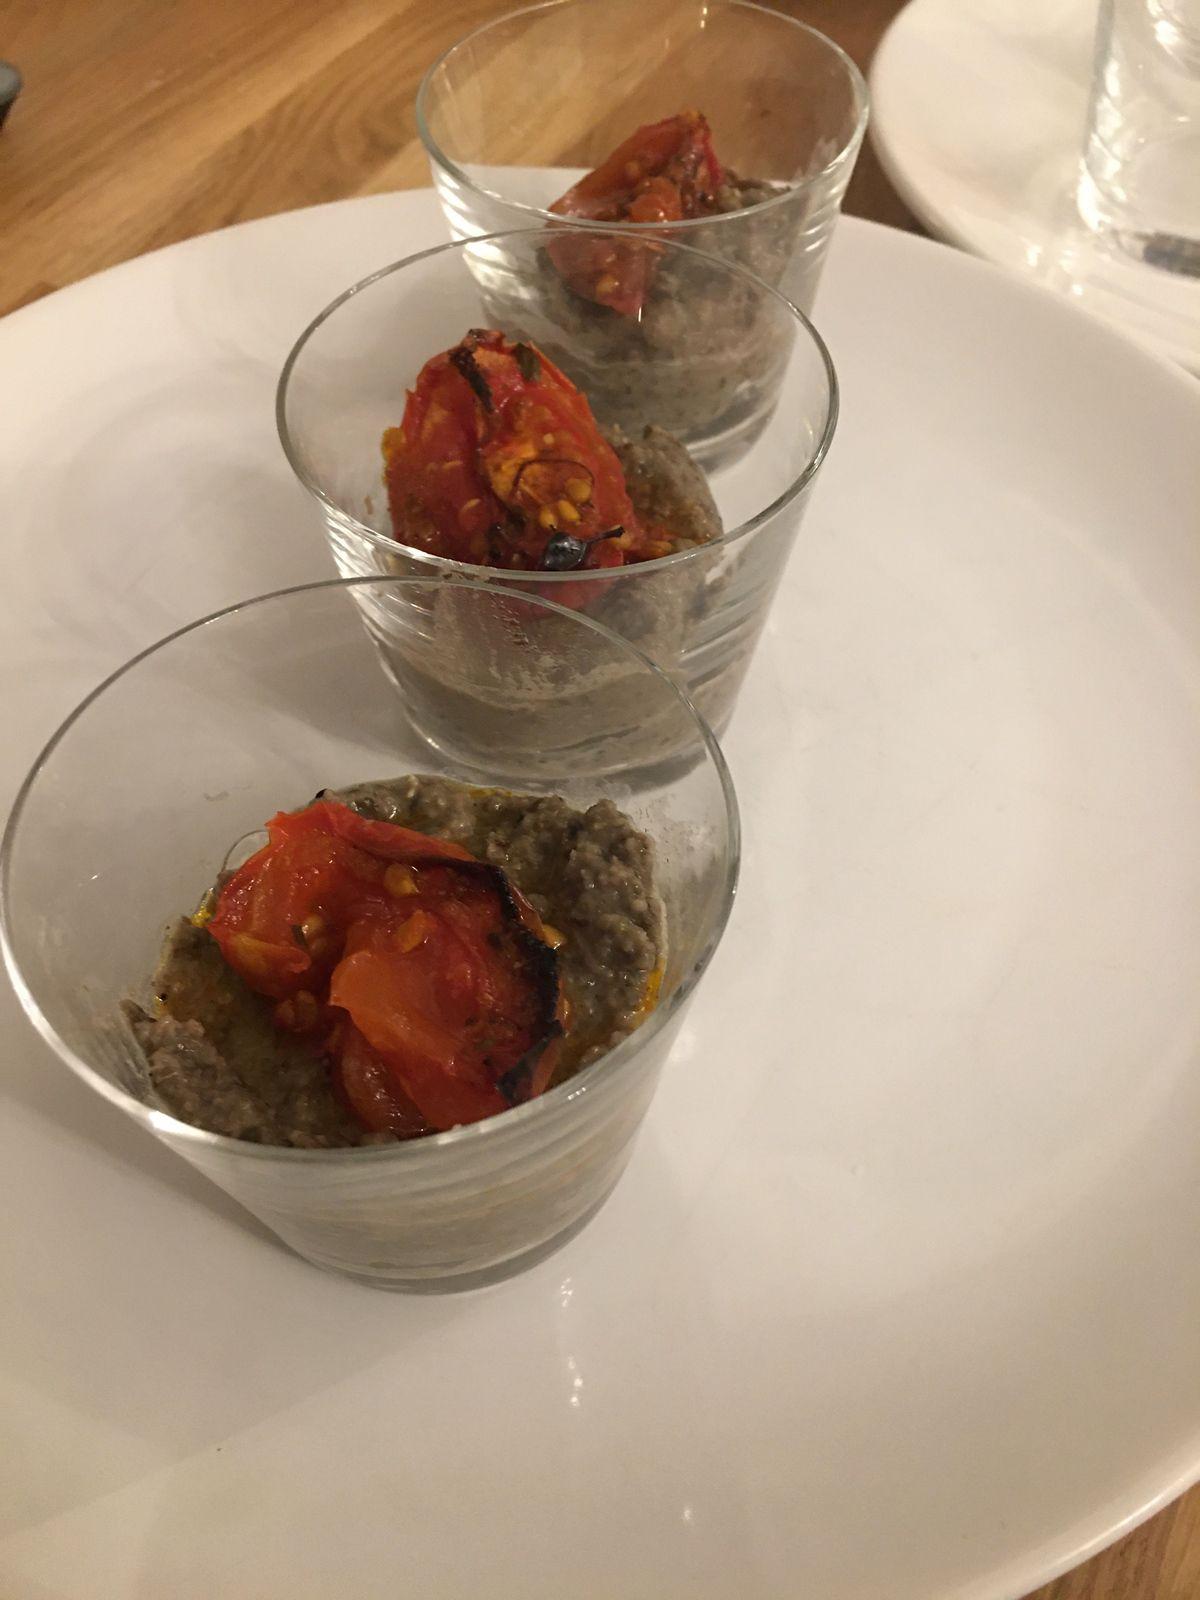 Caviar de lentilles vertes et tomates confites à la harissa